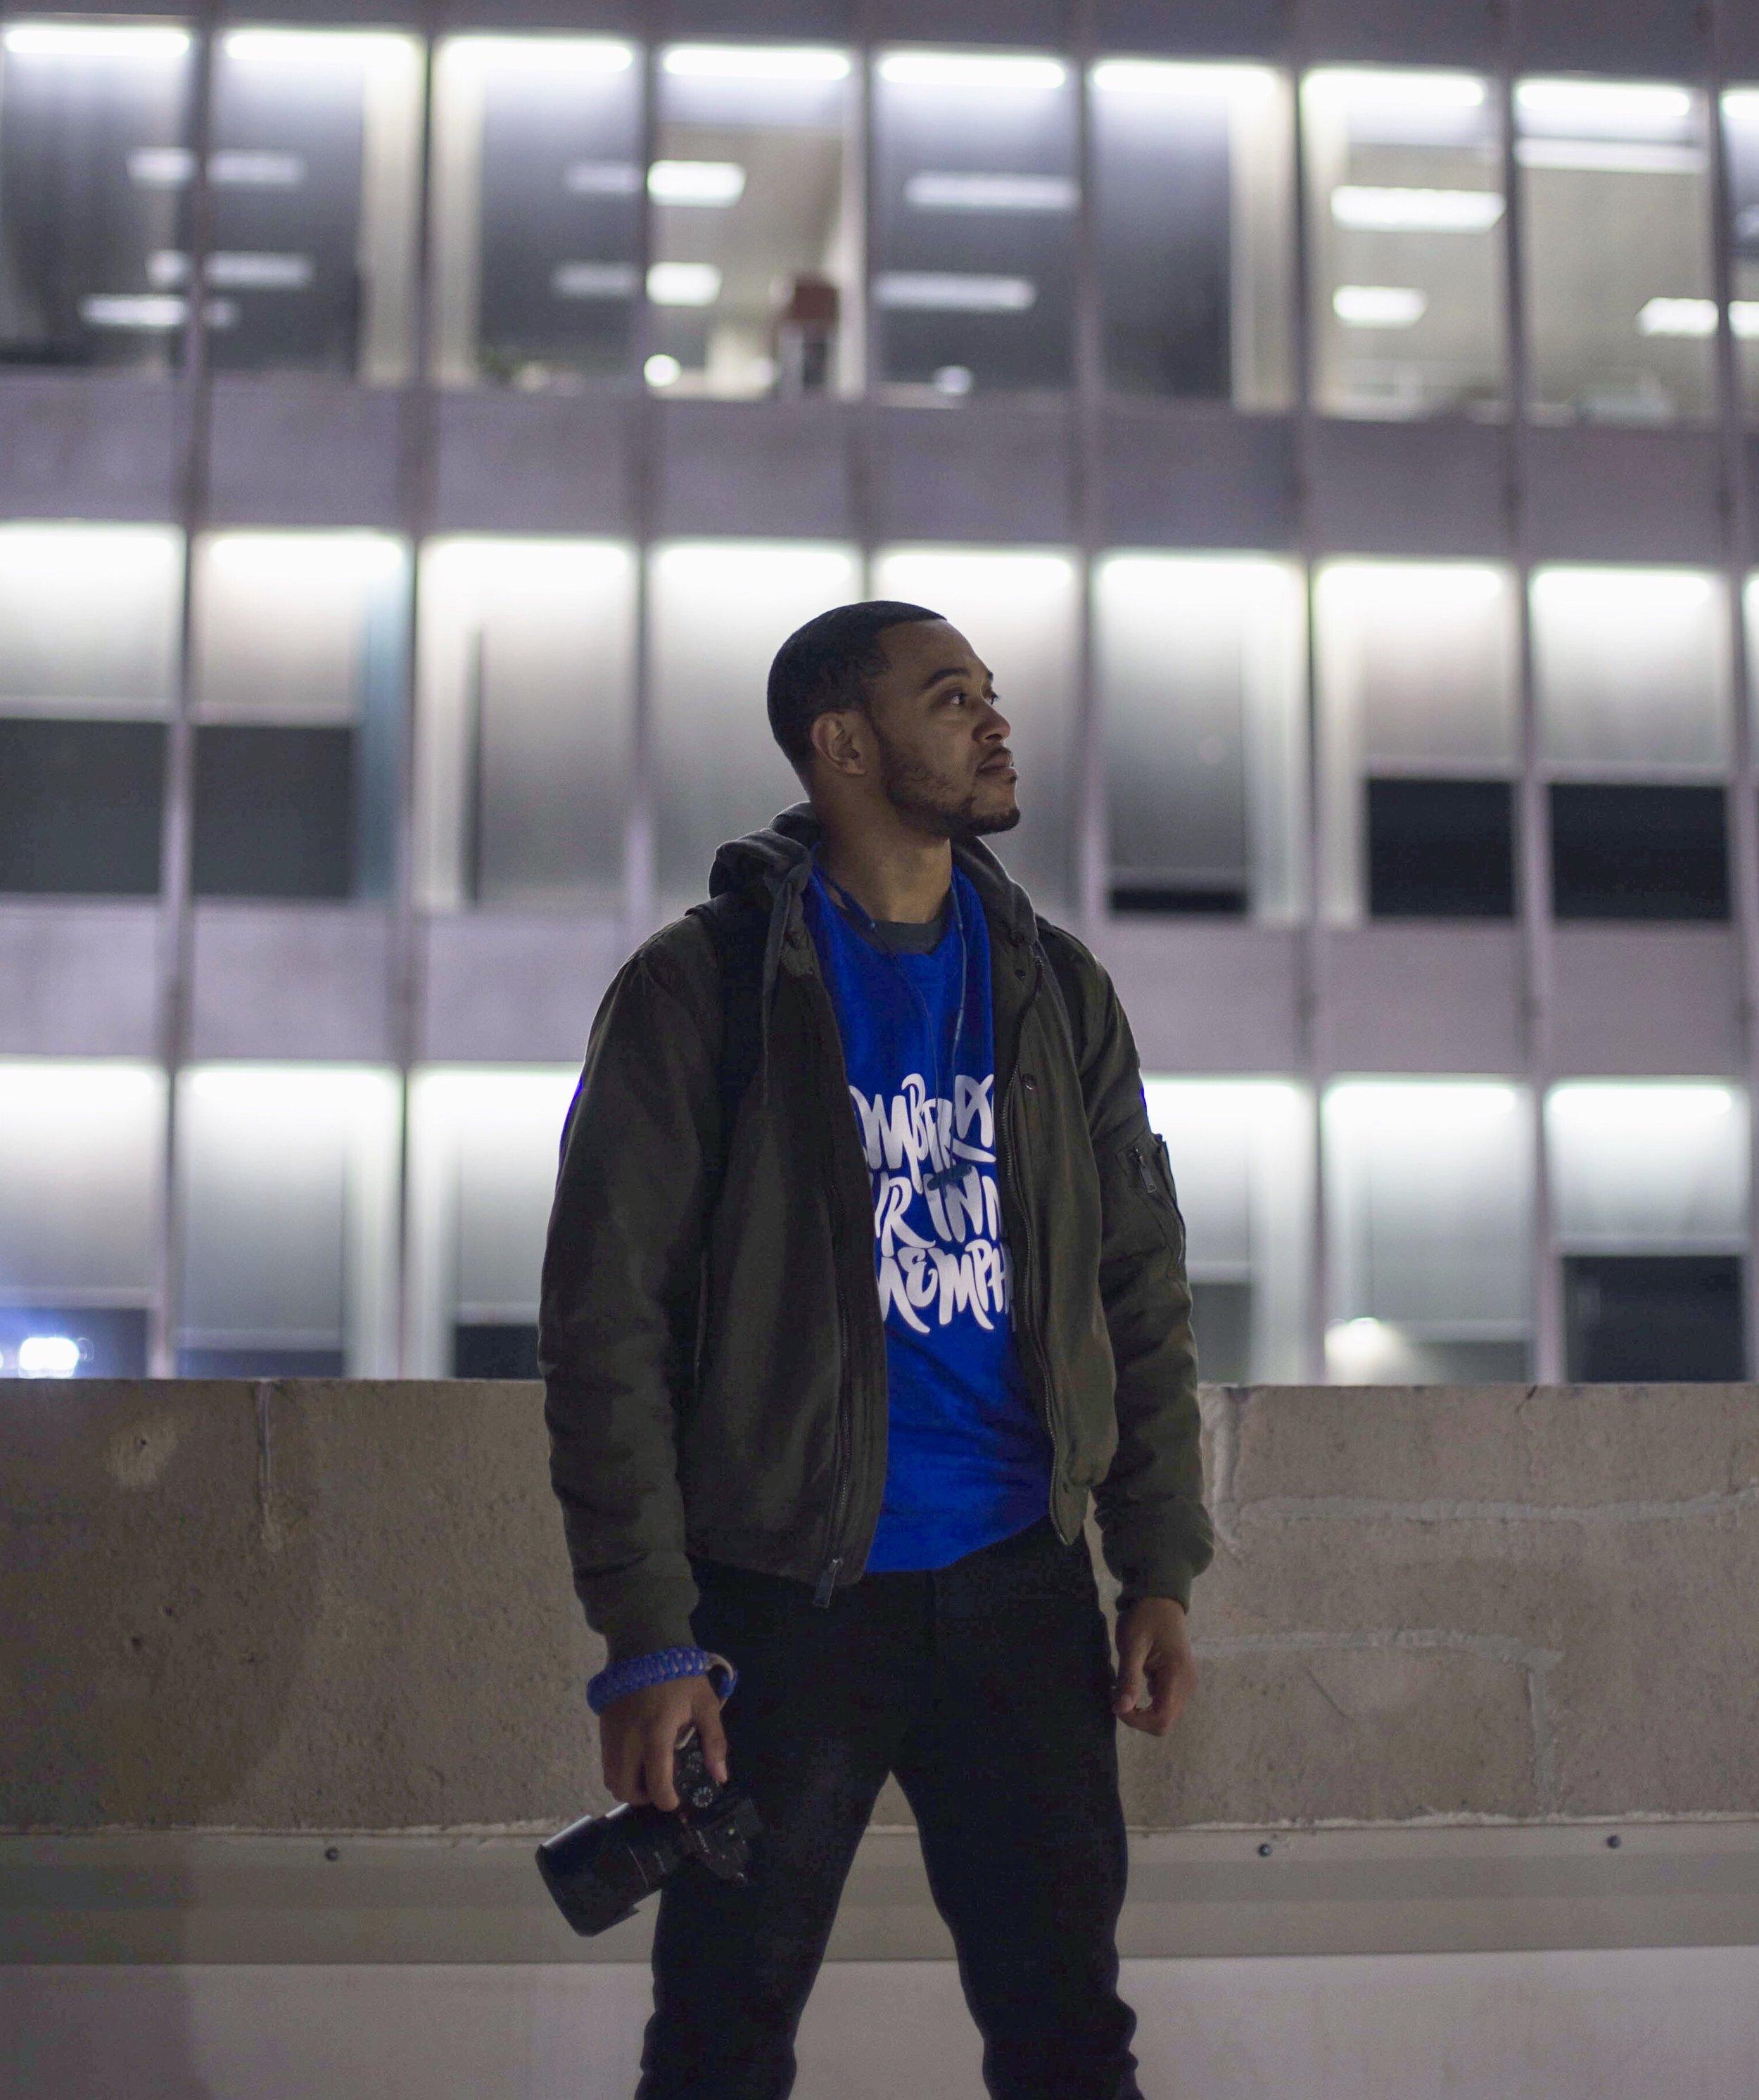 Urbex Gear: Jacket - Ben Sherman   Sweater - Embraceyourinner   Jeans - Old Navy   Camera Strap - Brave Straps   photo cred: @aleksworks